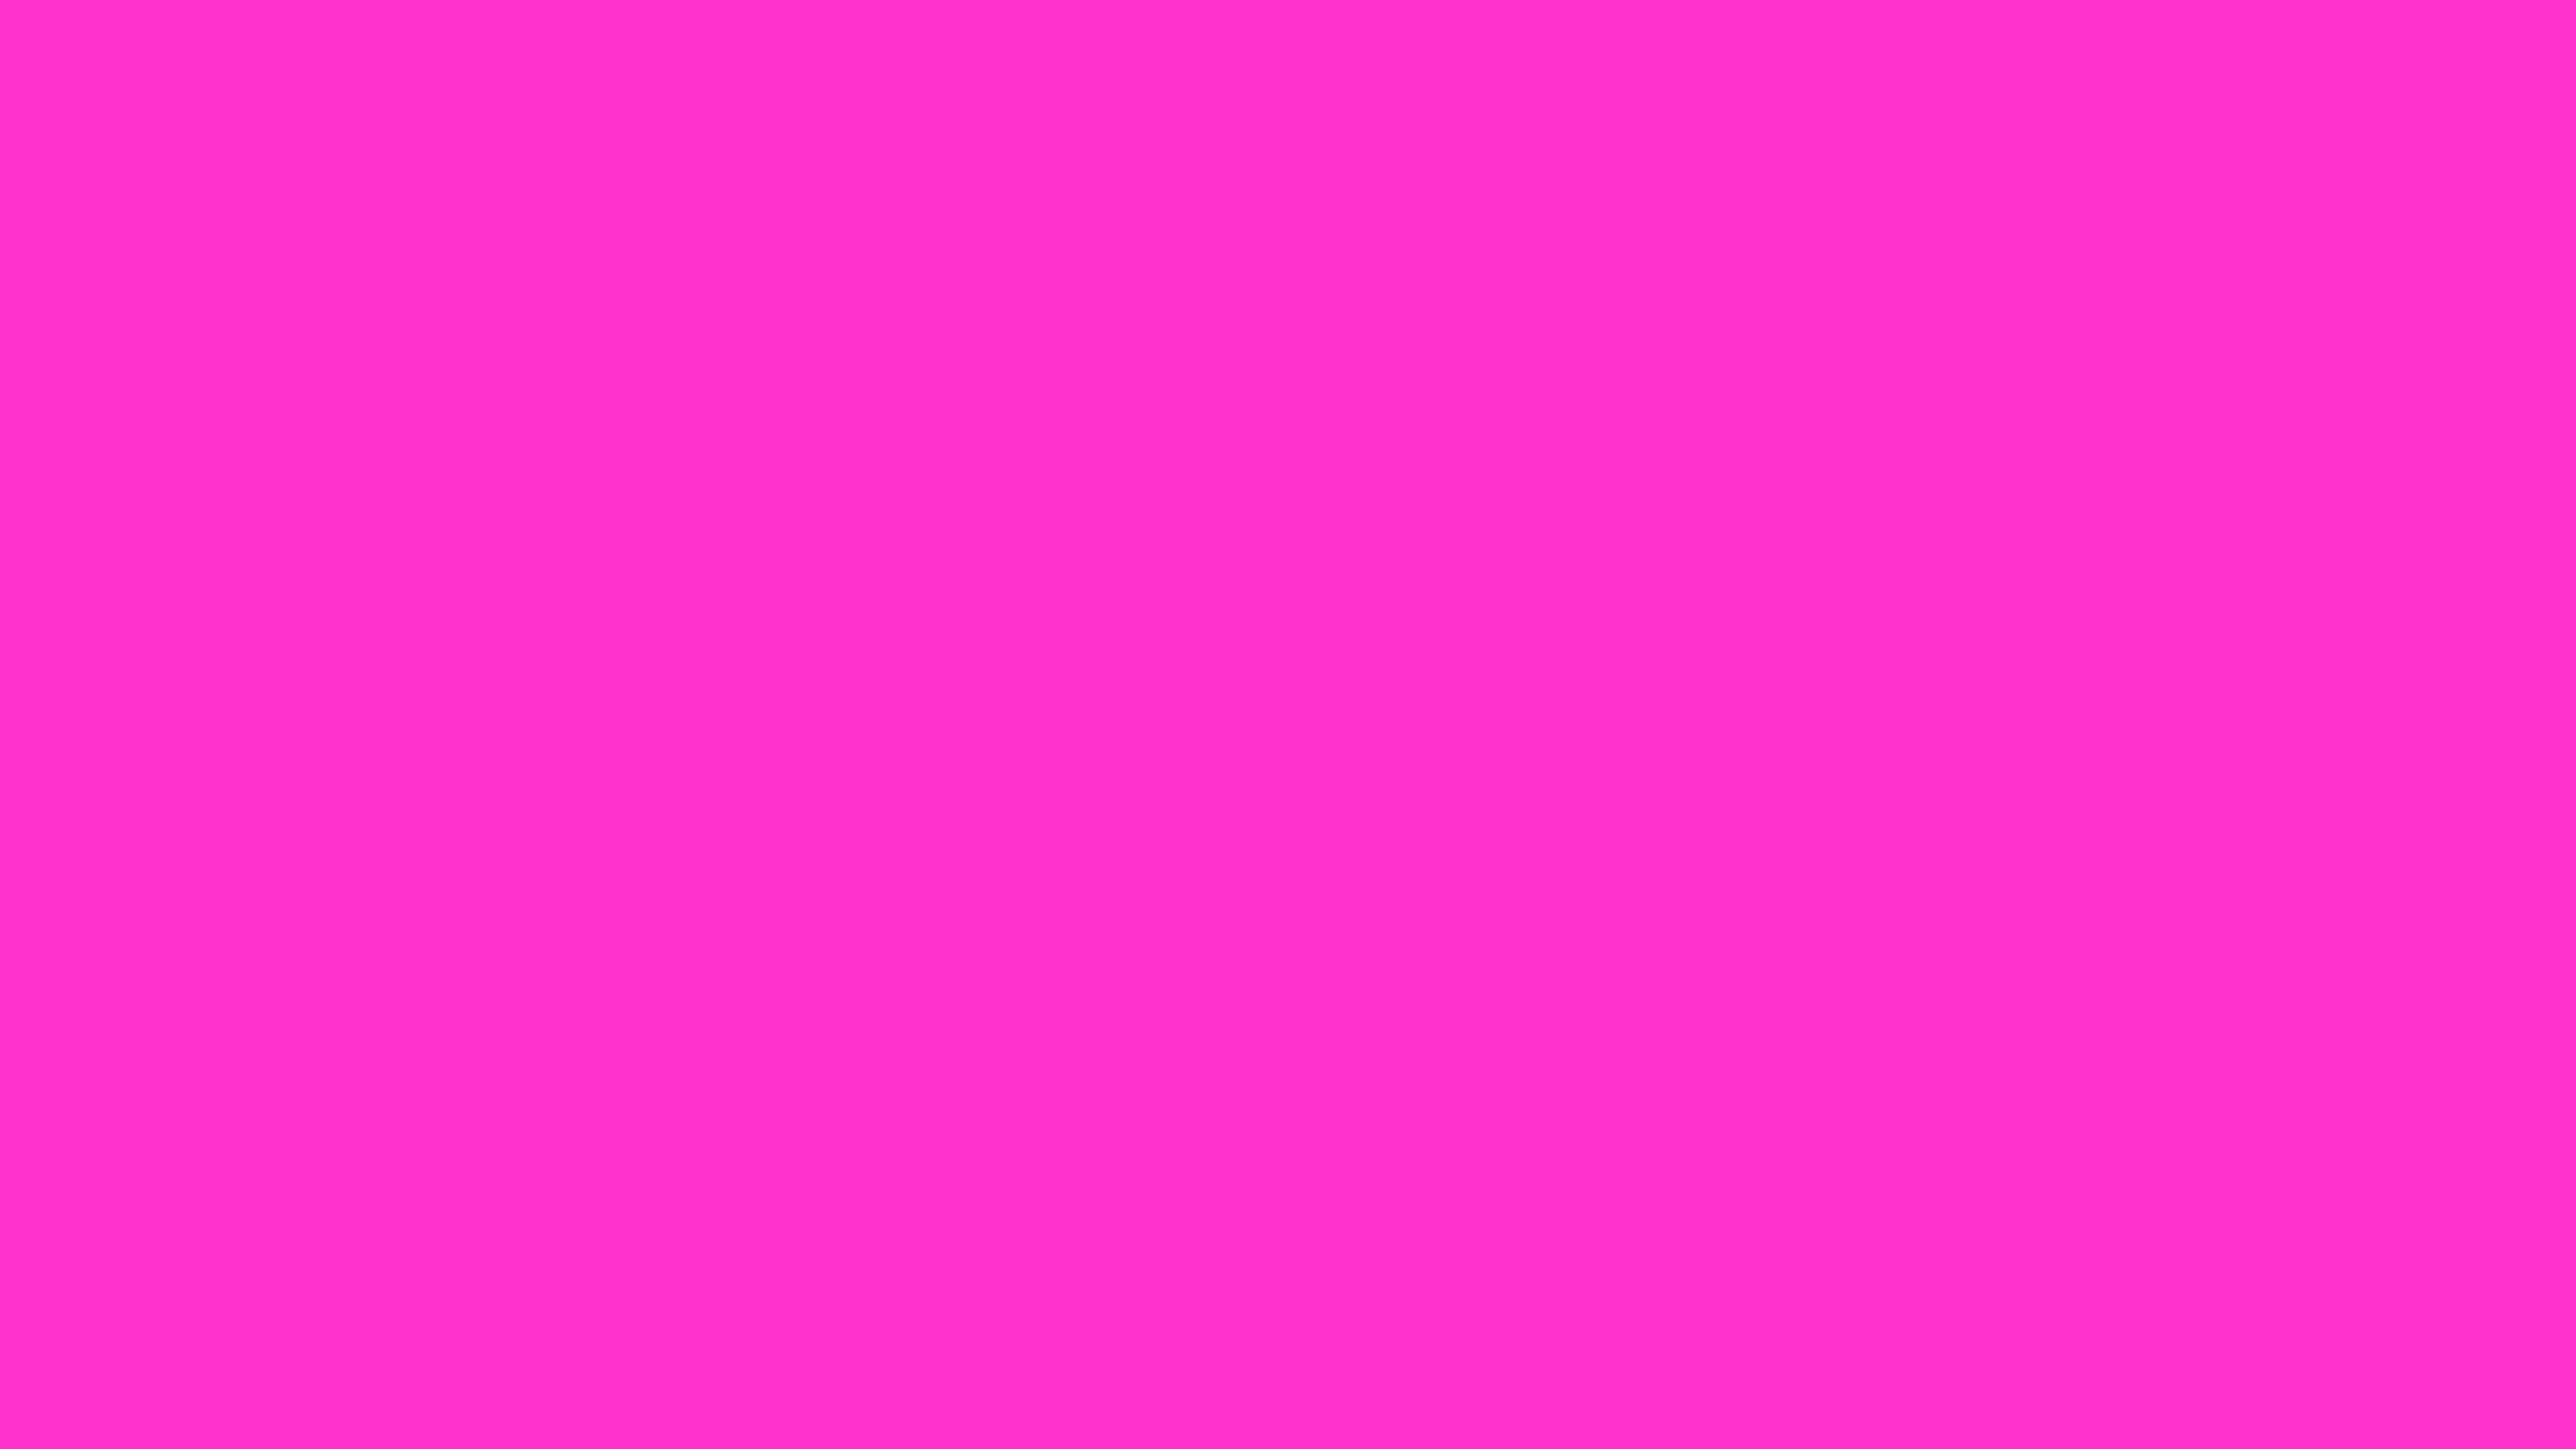 3840x2160 Razzle Dazzle Rose Solid Color Background